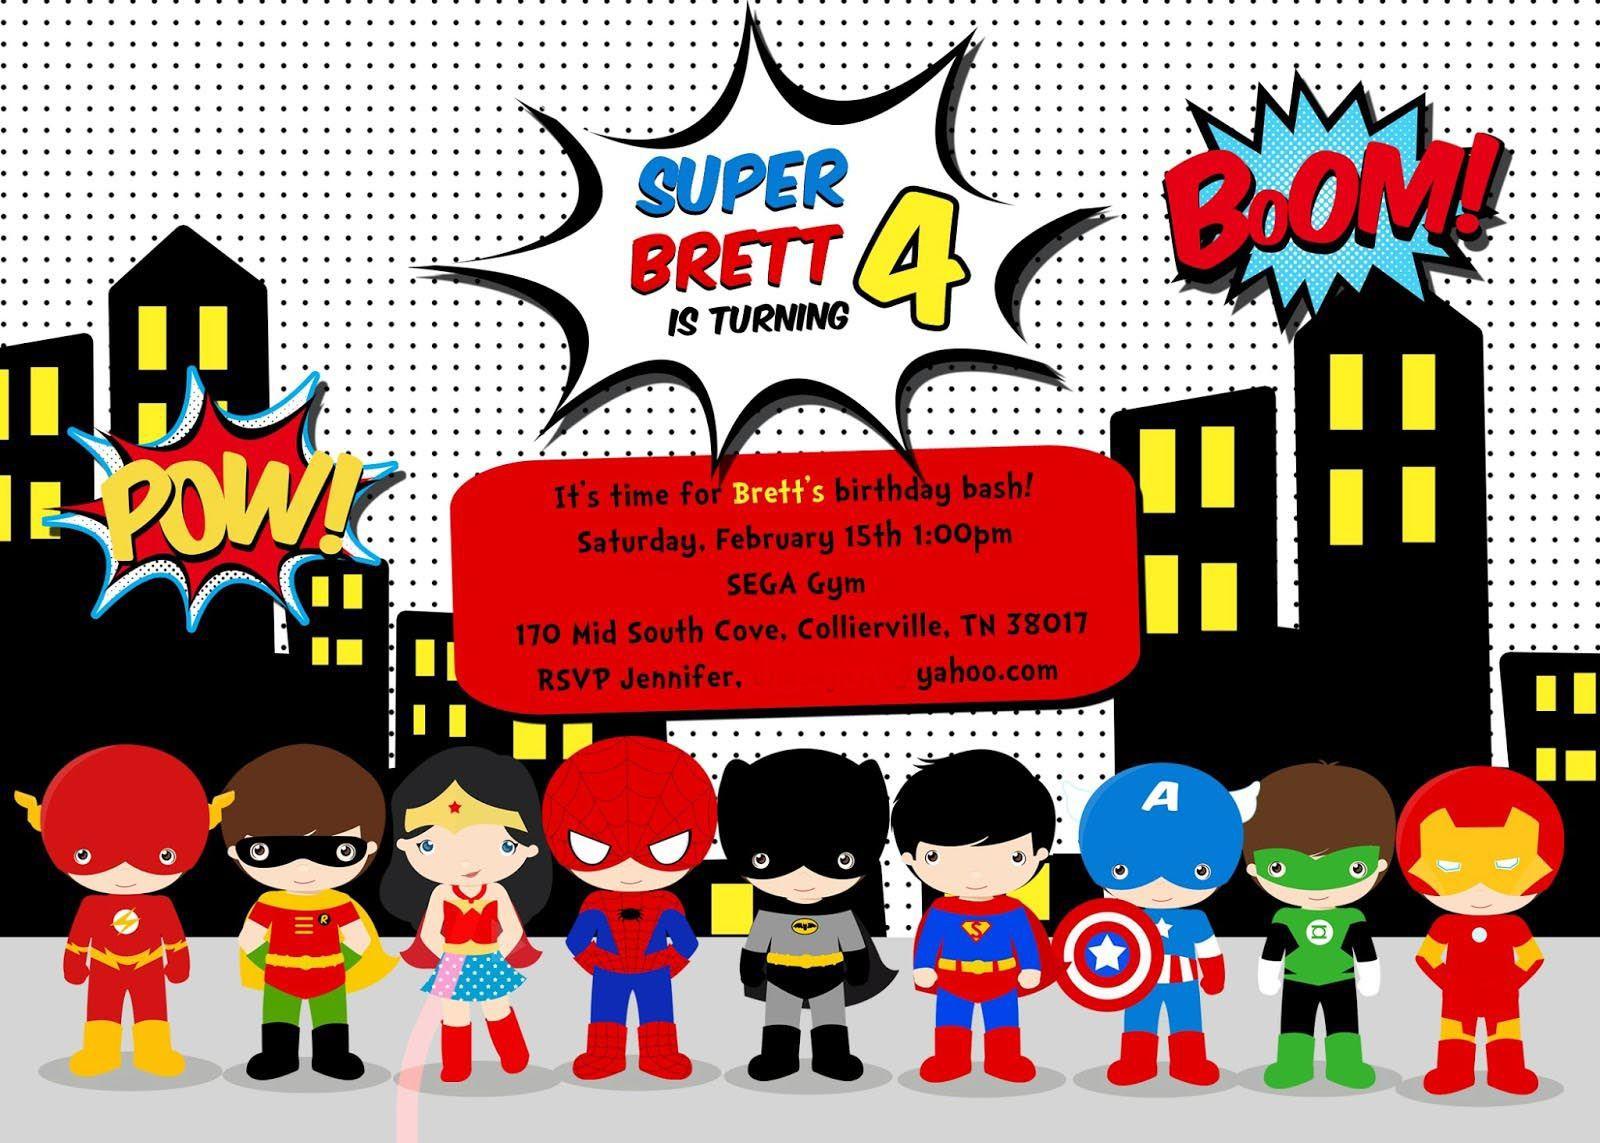 005 Stirring Superhero Birthday Invitation Template Free Highest Clarity Full